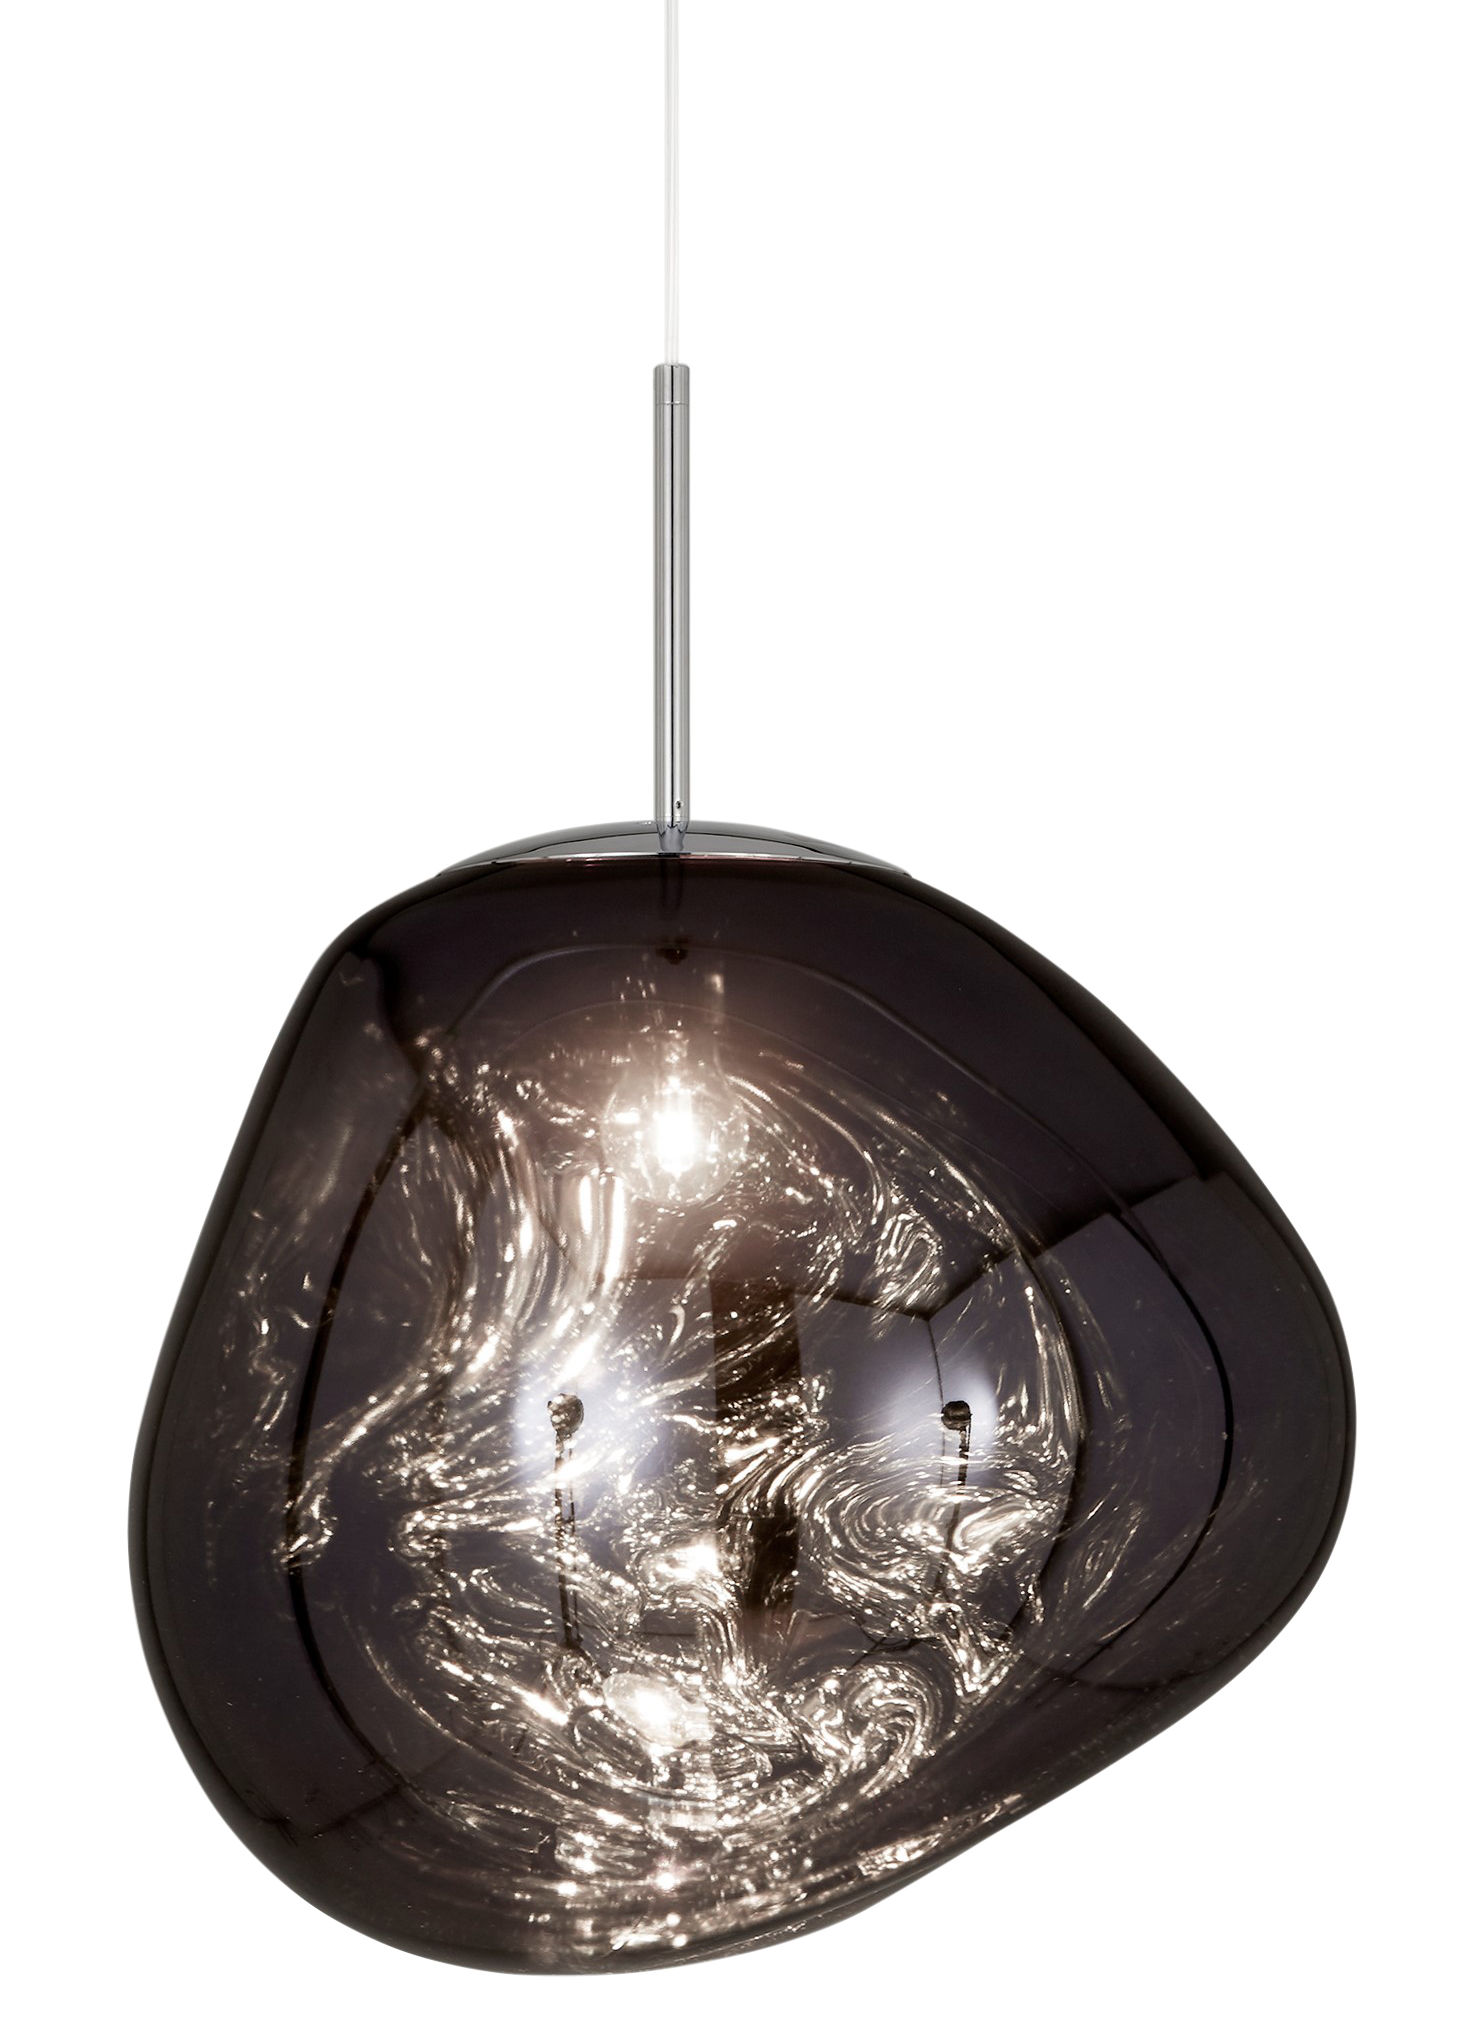 Lighting - Pendant Lighting - Melt Pendant - / Ø 50 cm by Tom Dixon - Smoked - Polycarbonate